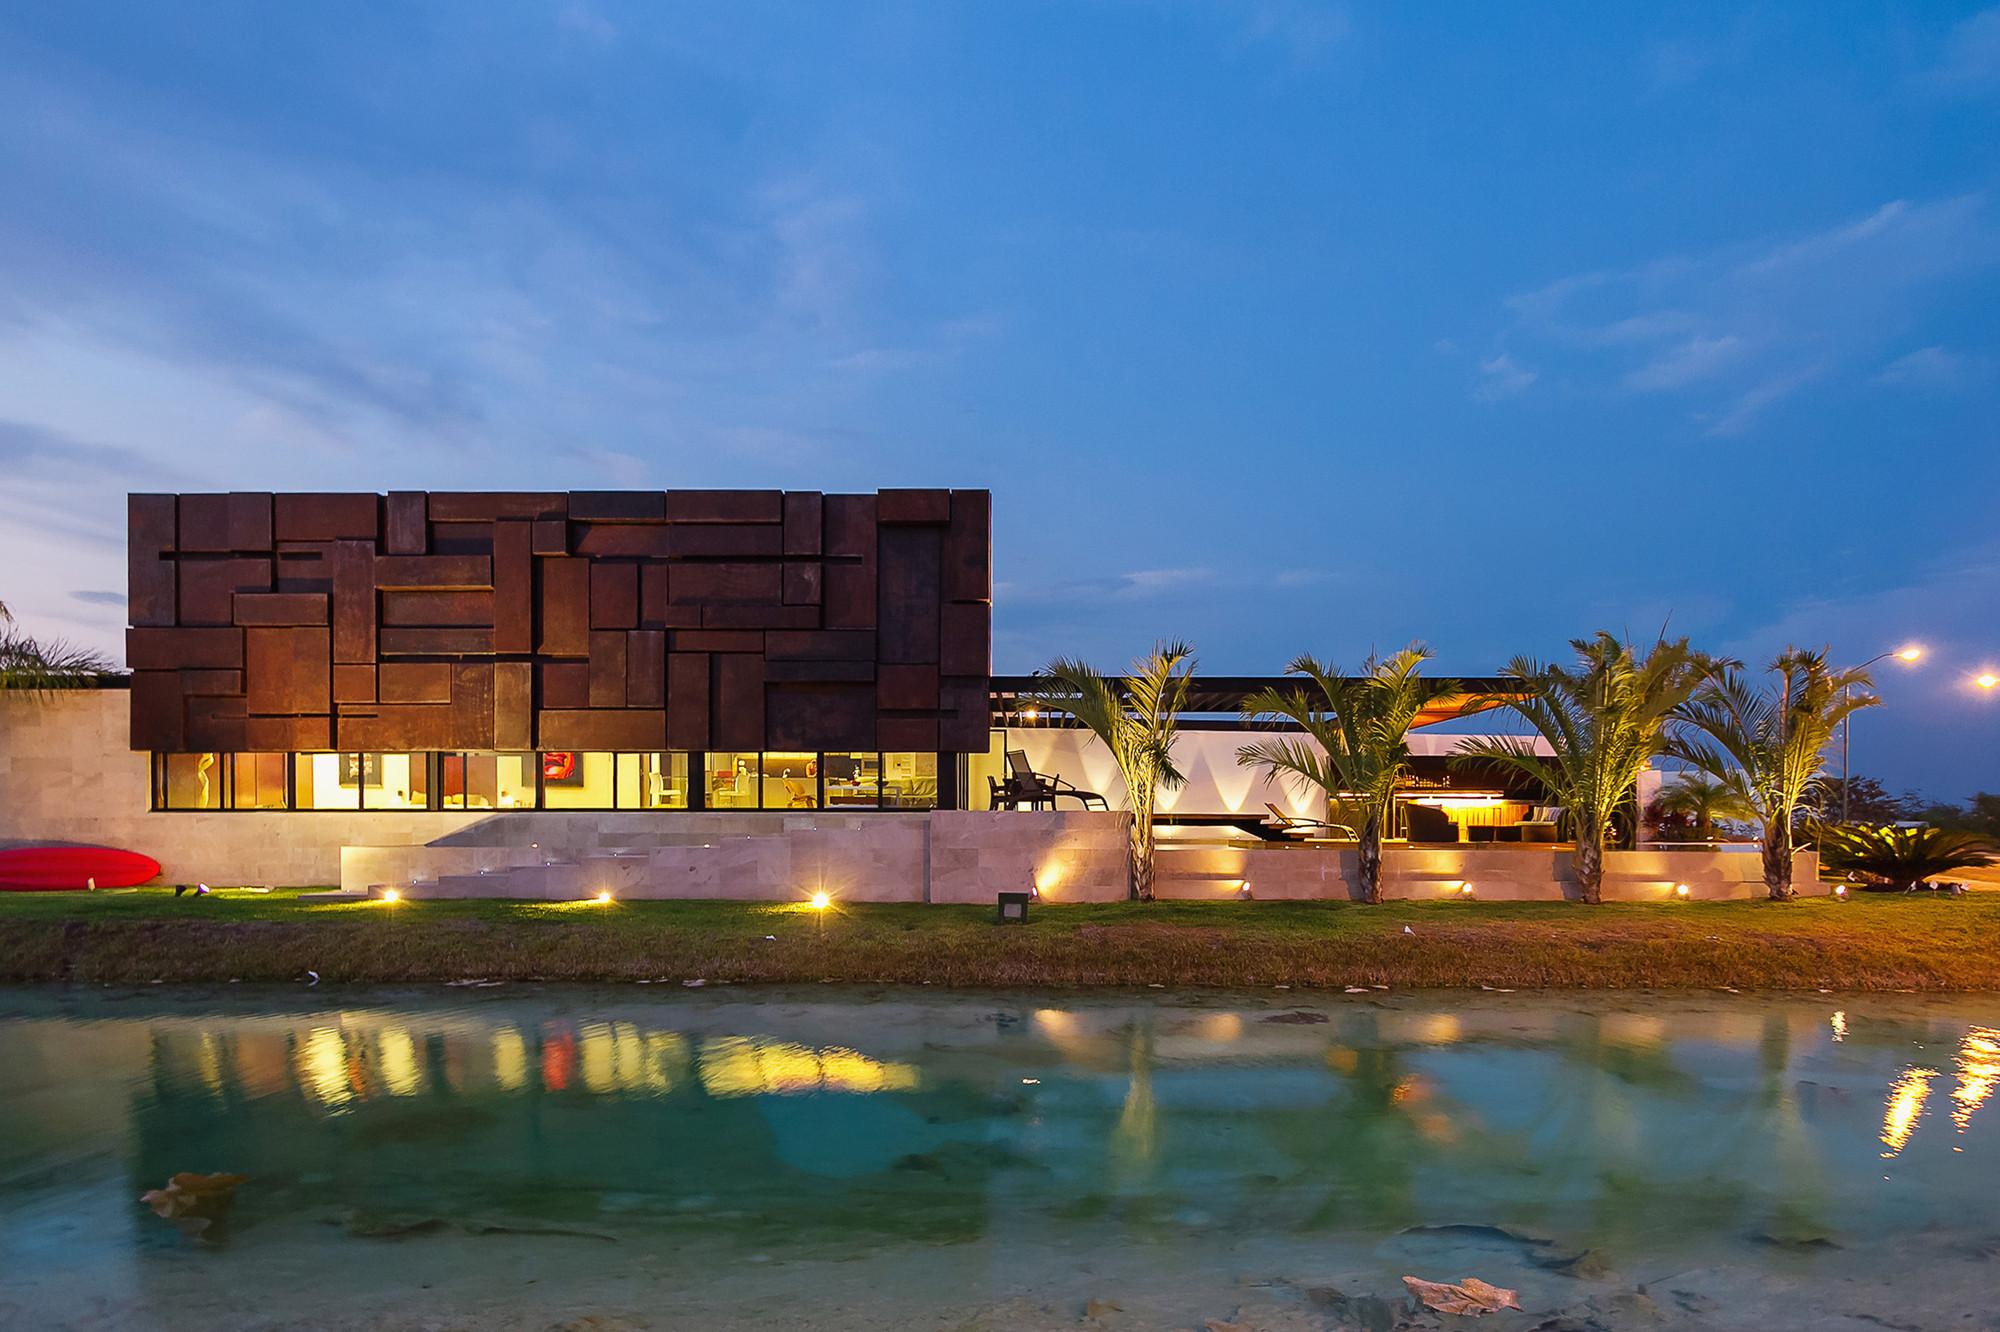 PL2 House / Seijo Peon Arquitectos y Asociados, © Tamara Uribe Photography